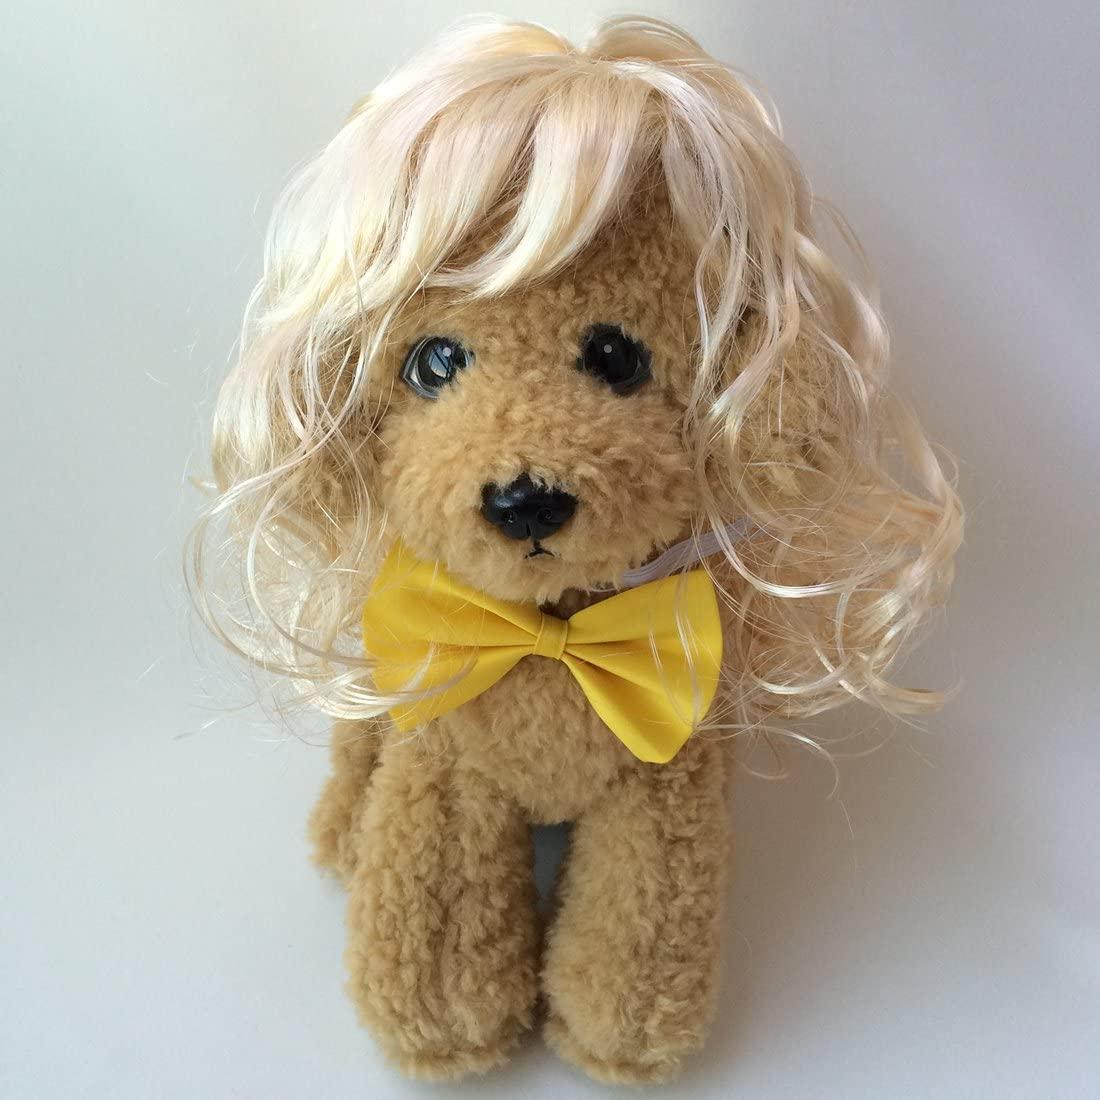 Hodorli Cosplay Adorable Blonde Pet Dog Wig with Bow Tie